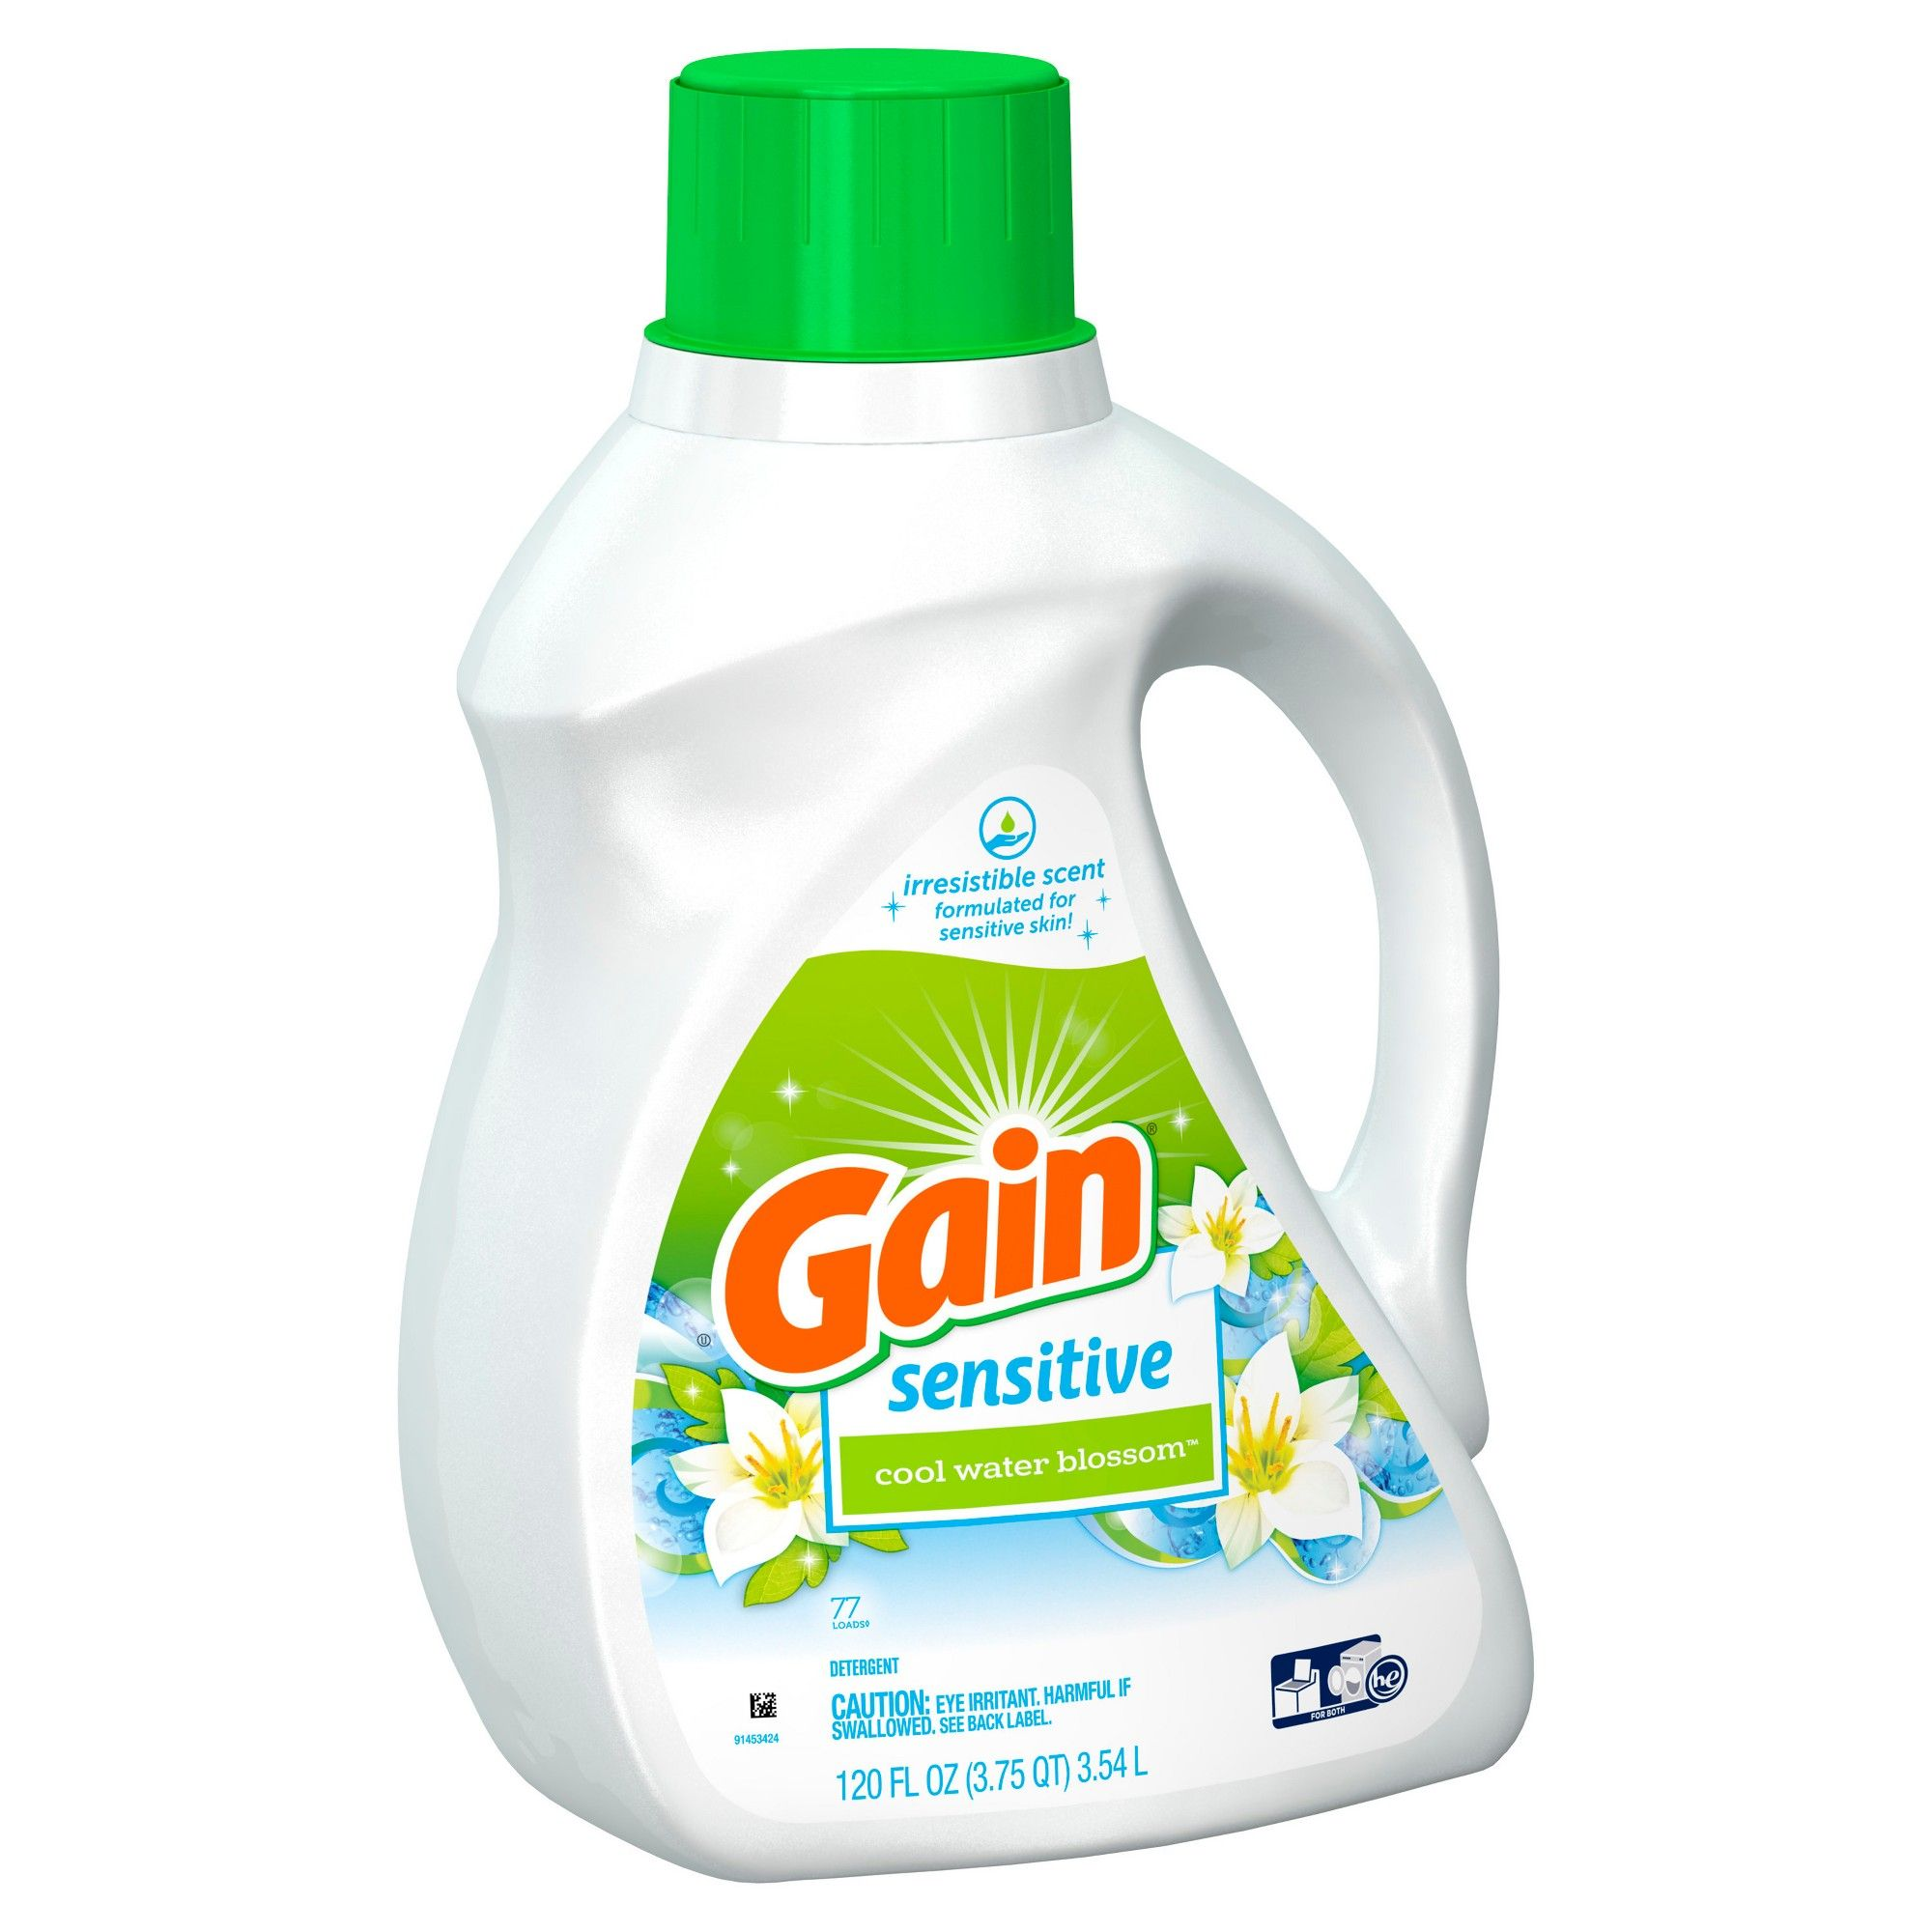 Gain Cool Water Blossom Sensitive Liquid Laundry Detergent 120